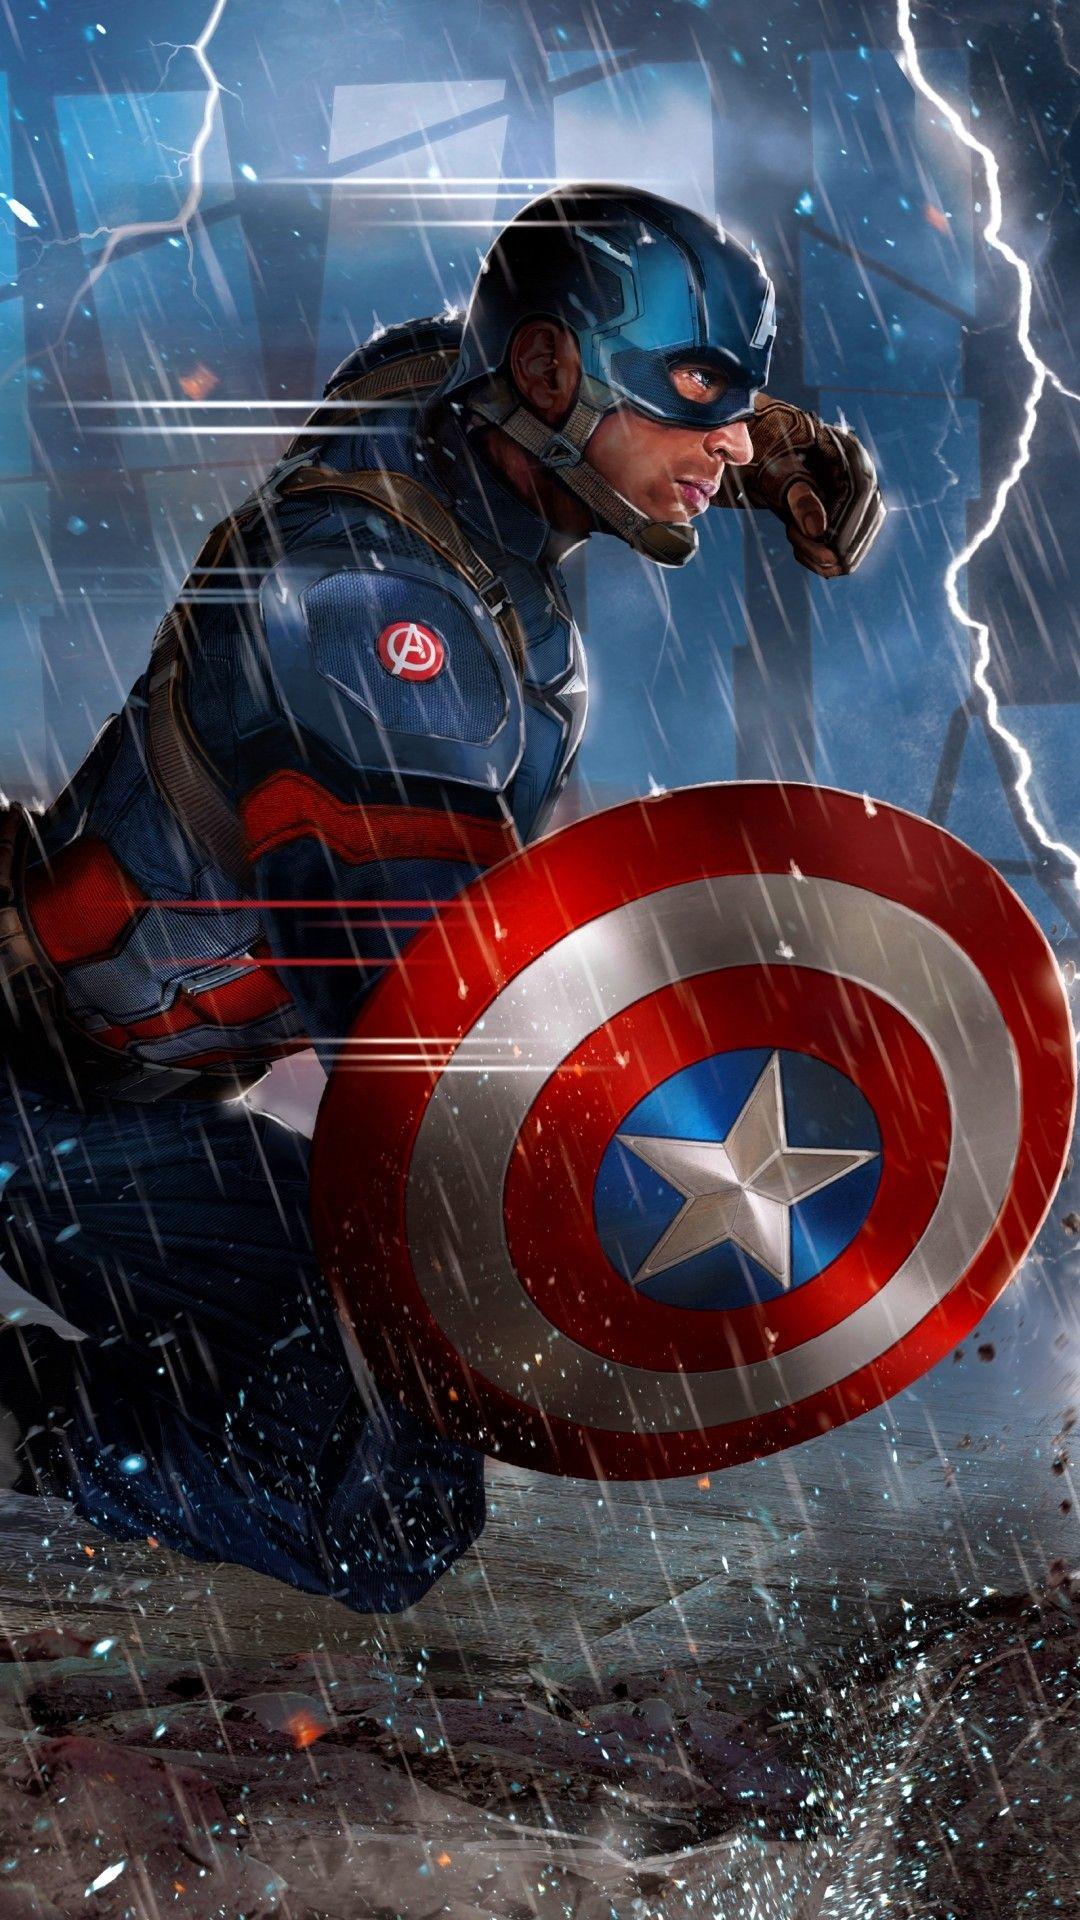 Captain America Hd Mobile Wallpapers Wallpaper Cave